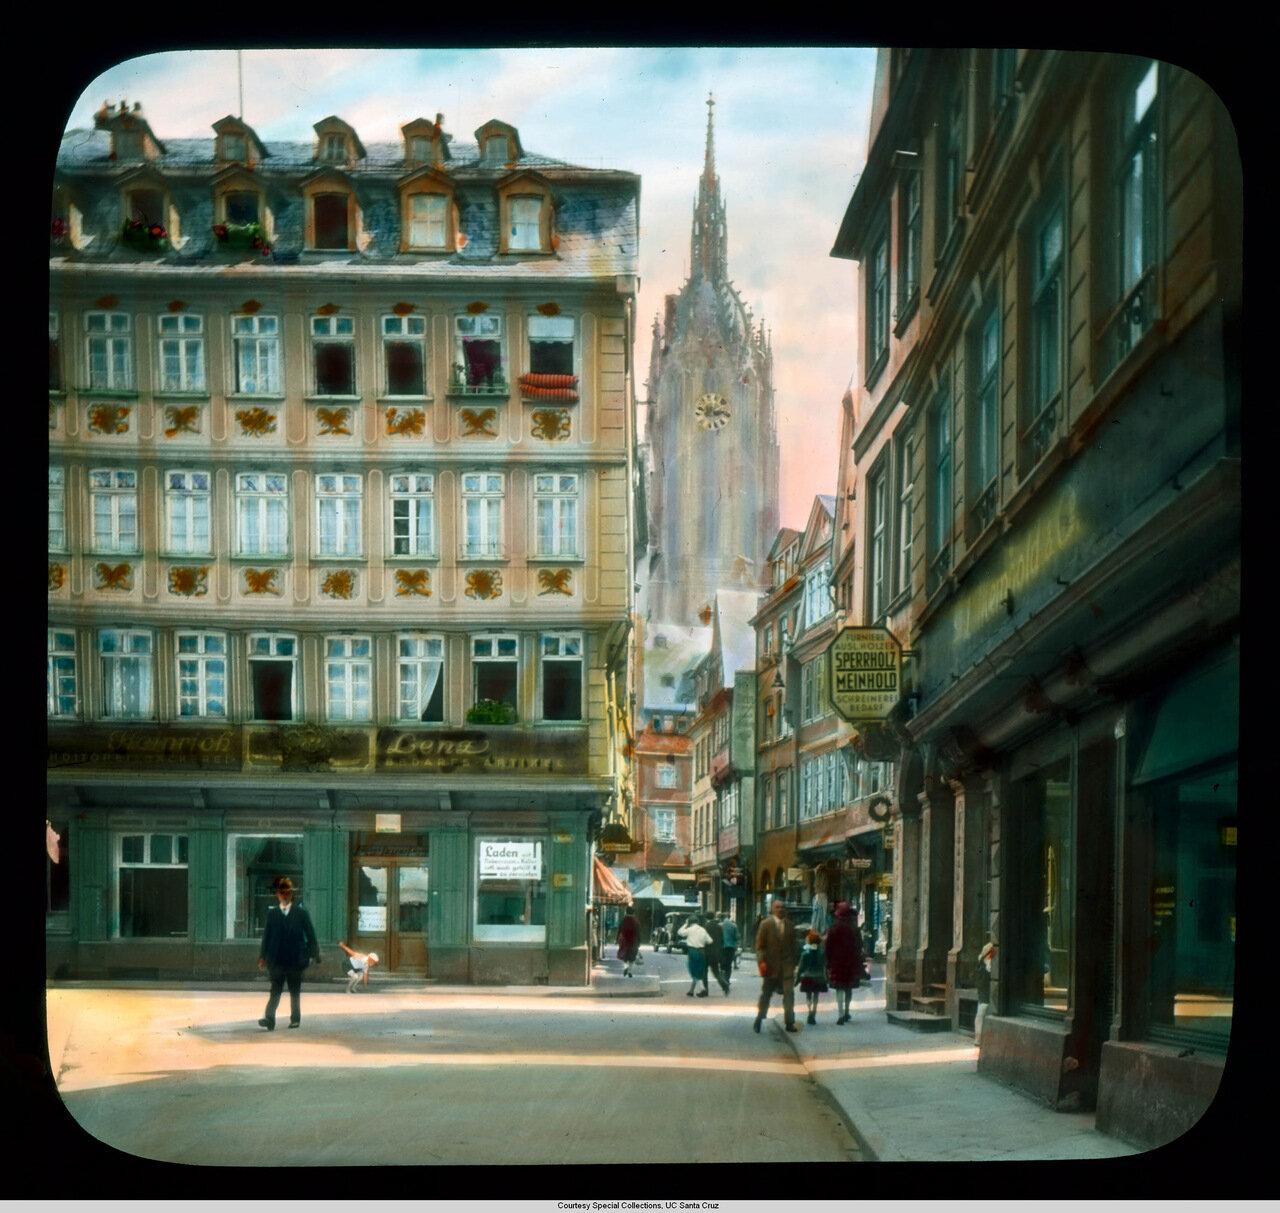 Франкфурт-на-Майне. Магазины на площади Рёмерберг и башня Собора с часами вдали